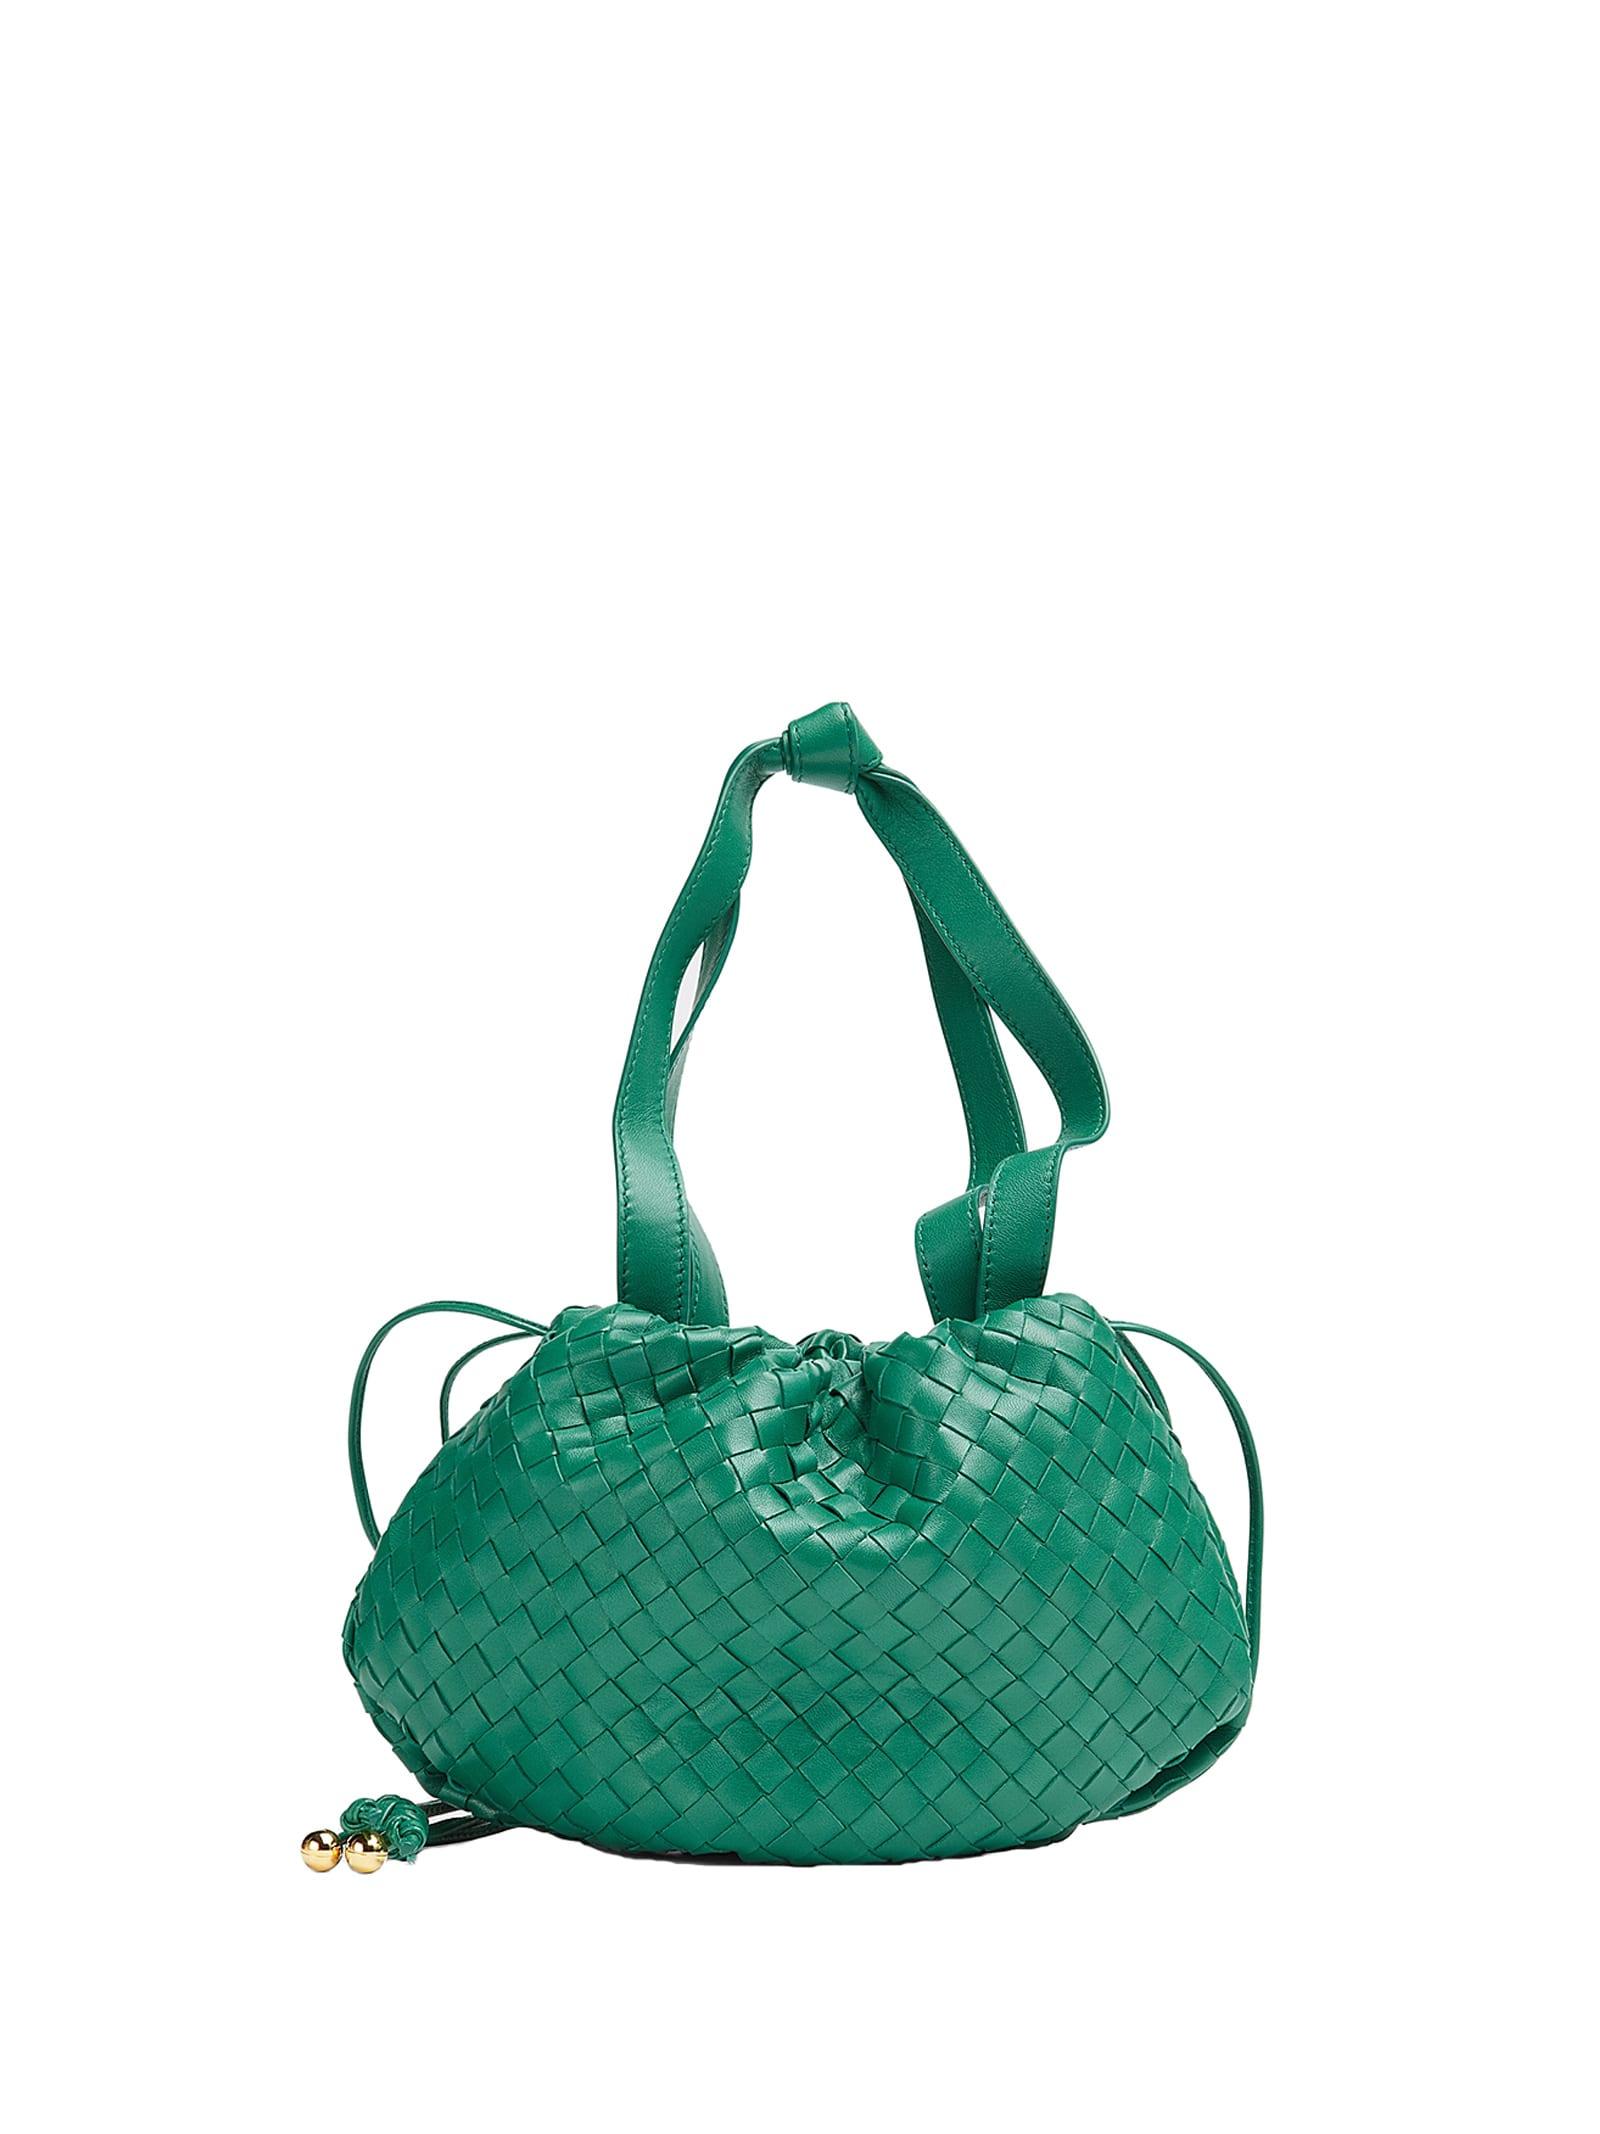 Bottega Veneta Bottega Veneta Woven Leather Tote Bag